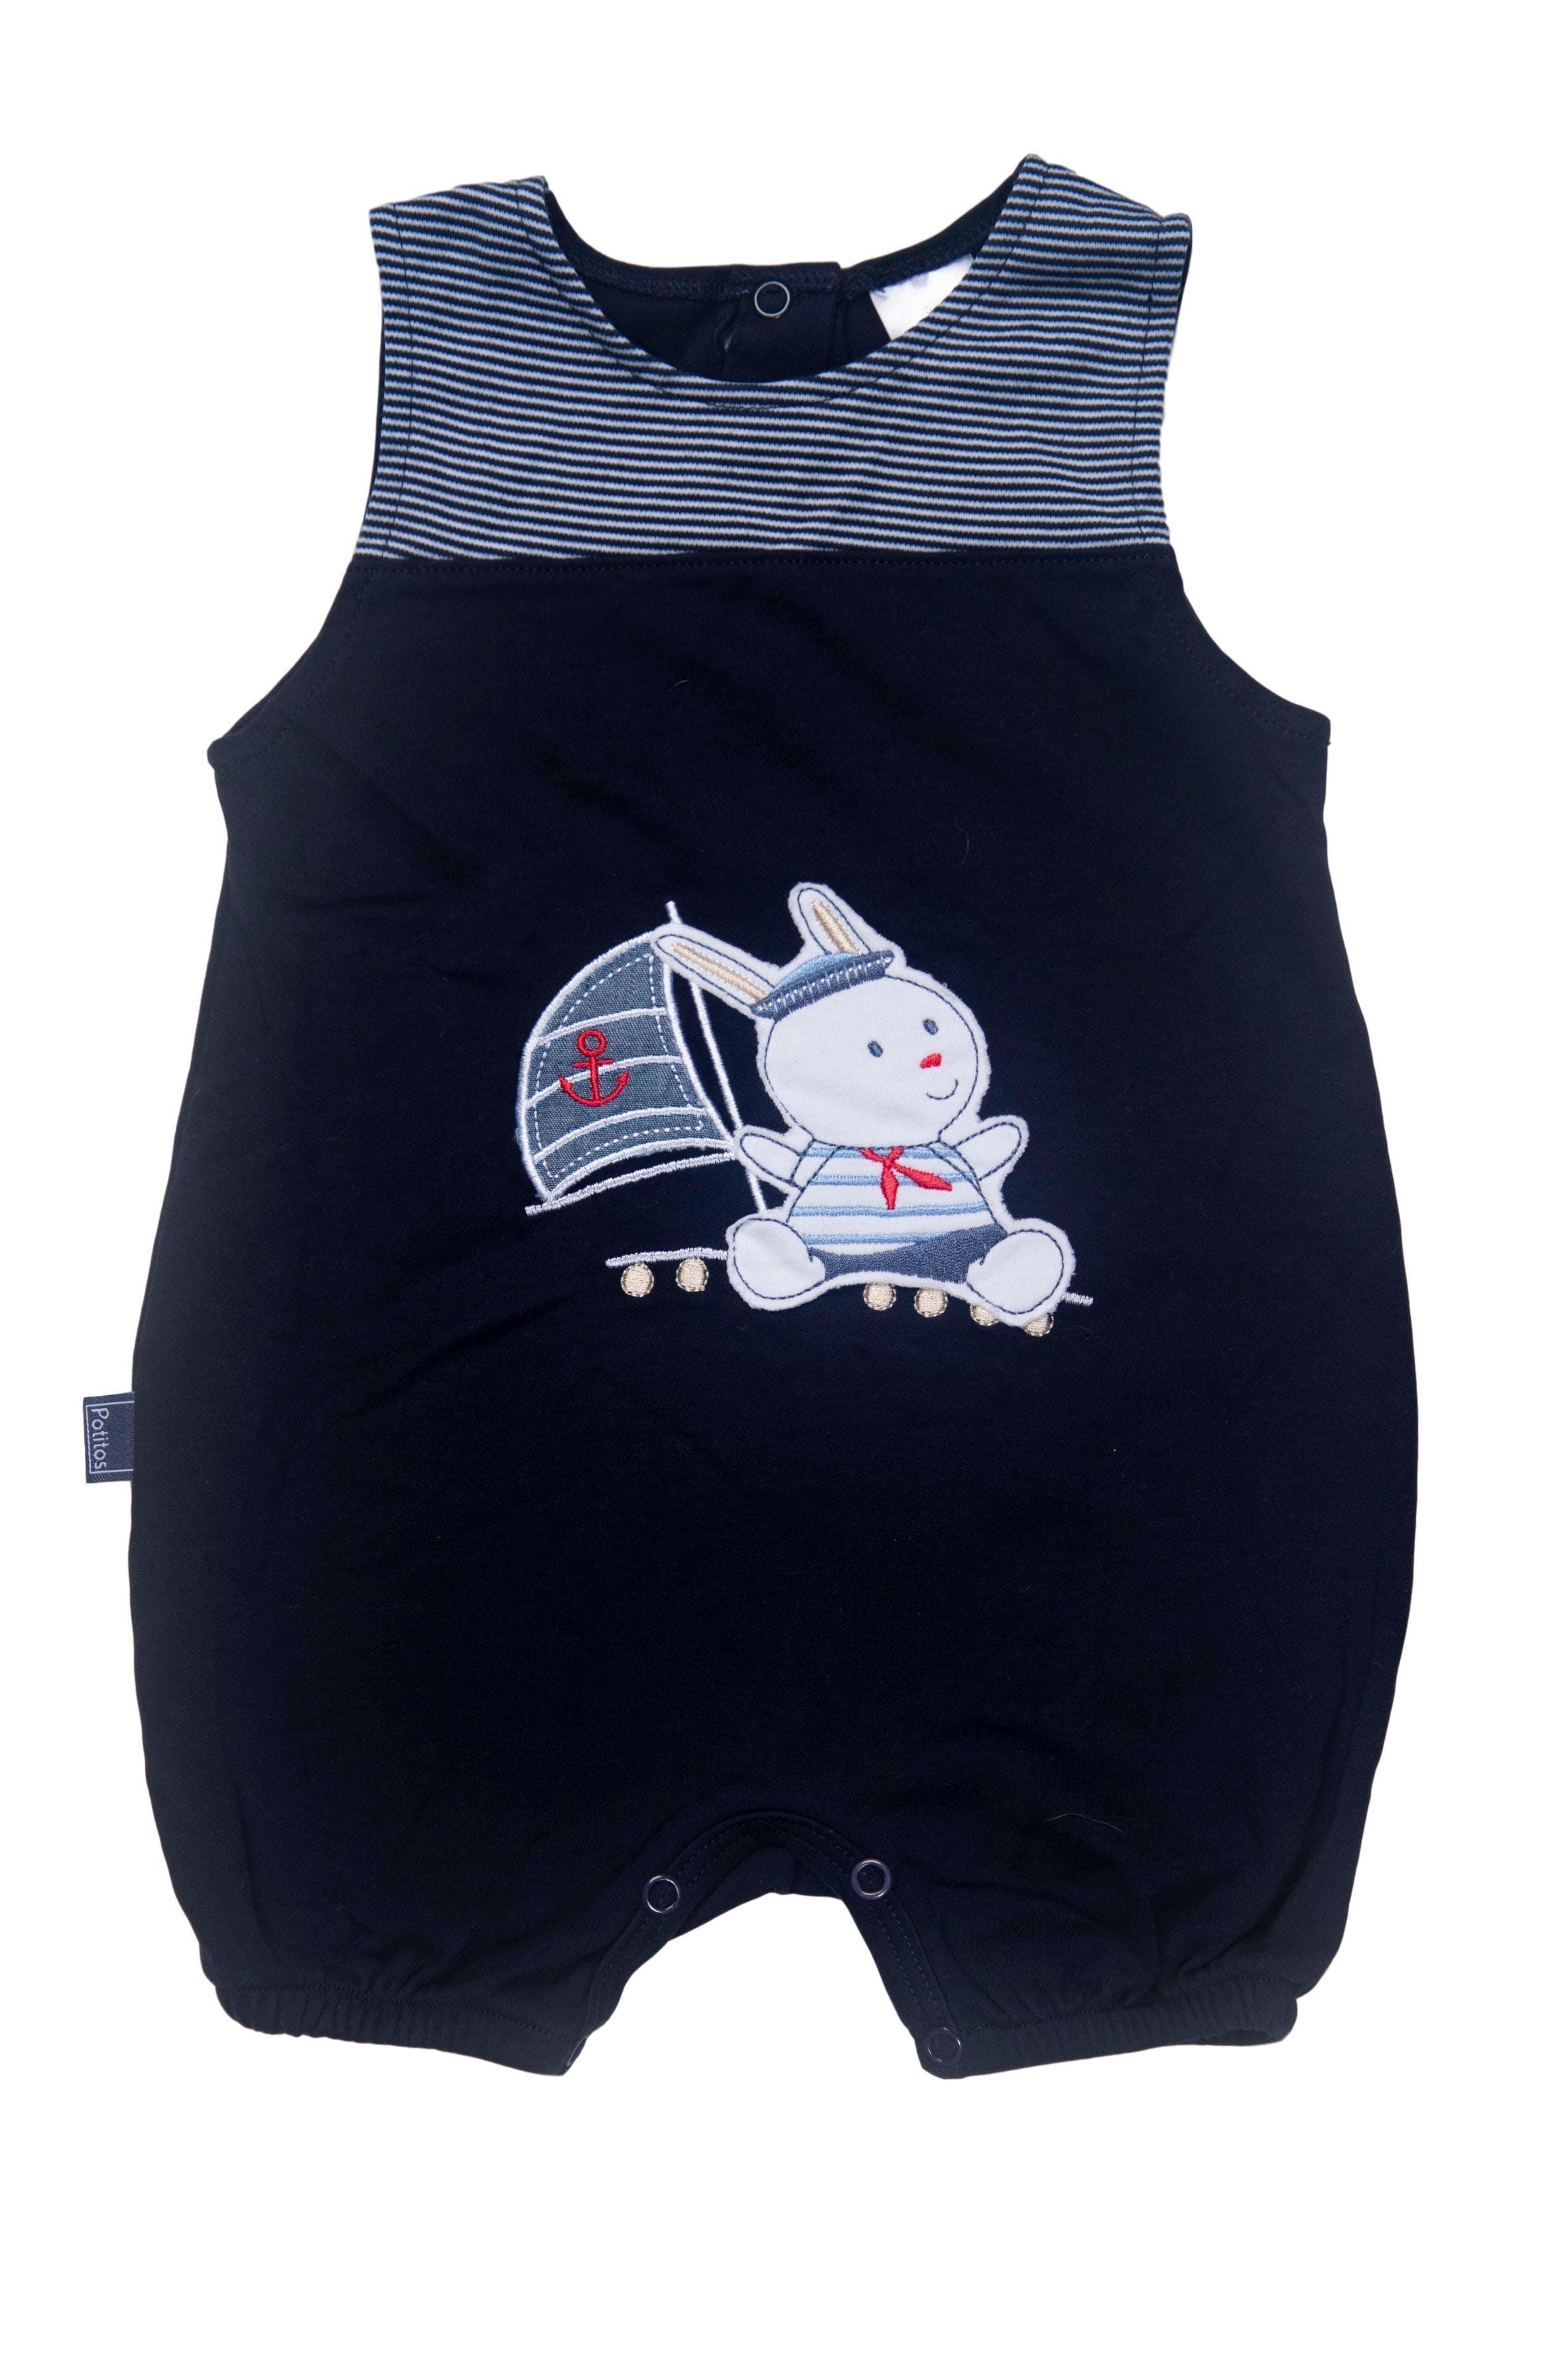 enterizo azul oscuro conejo marinero 100% algodon - Potitos